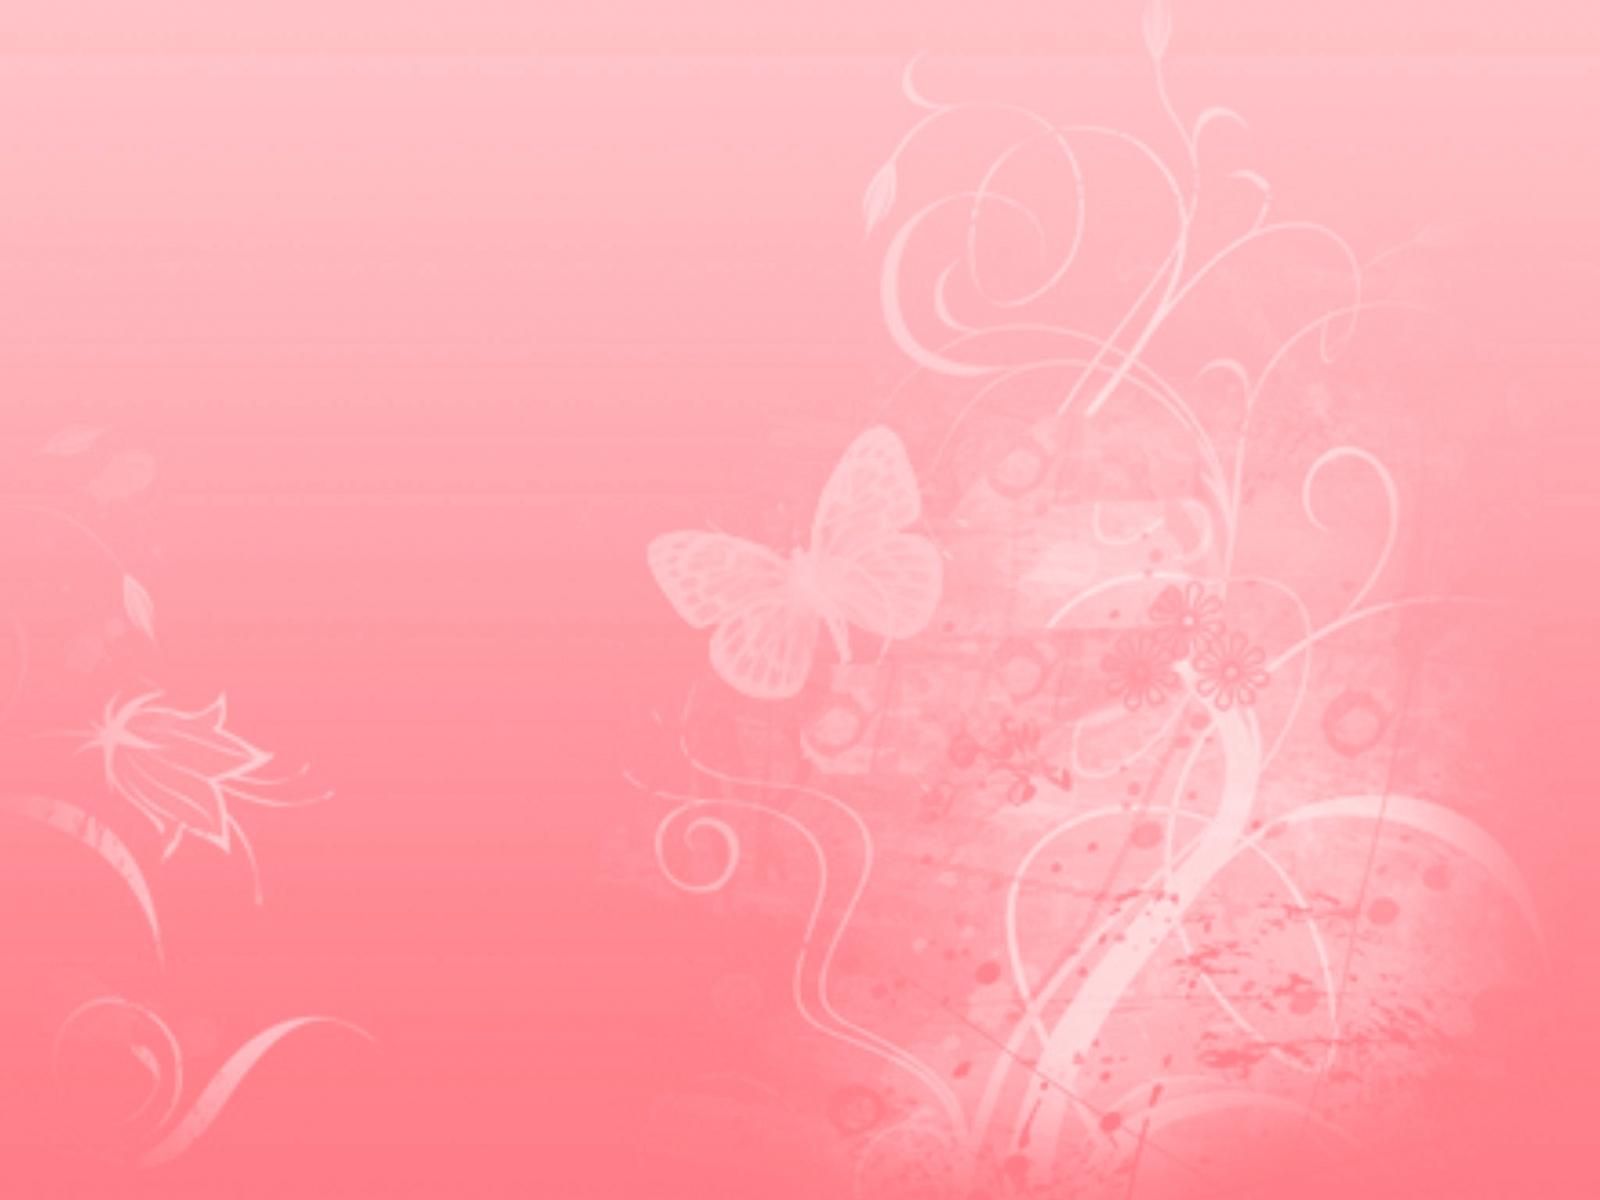 Fractal Pink Wallpaper